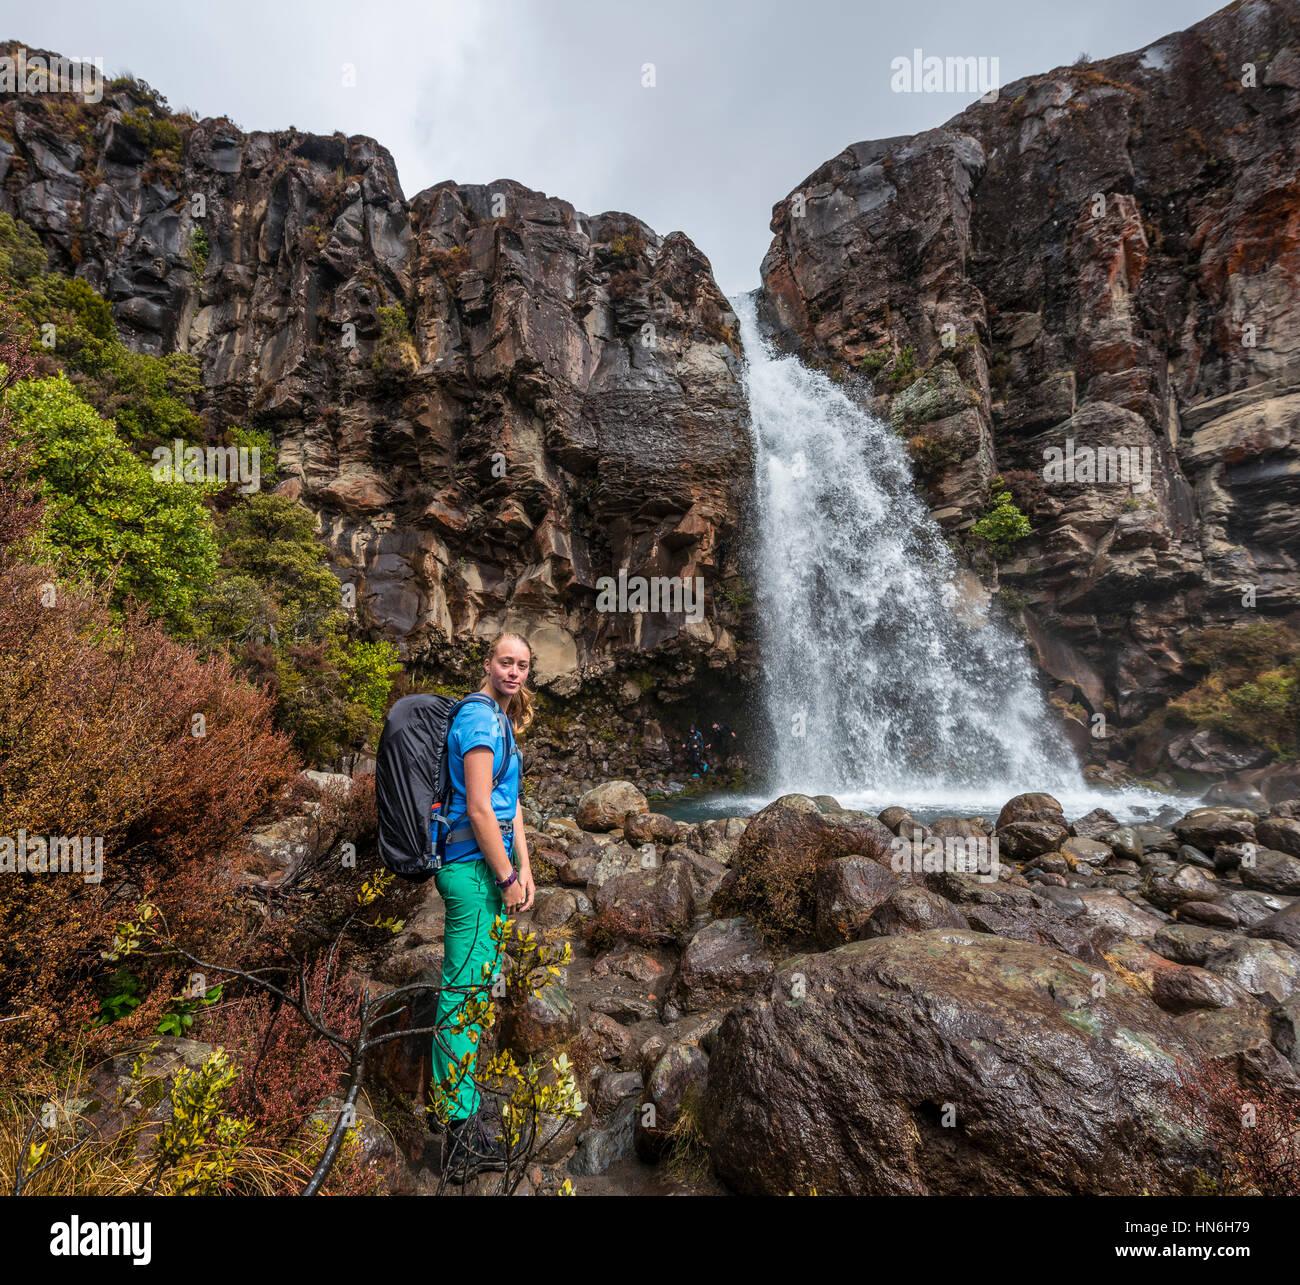 Hiker the Taranaki Falls, waterfall, Tongariro National Park, North Island, New Zealand - Stock Image